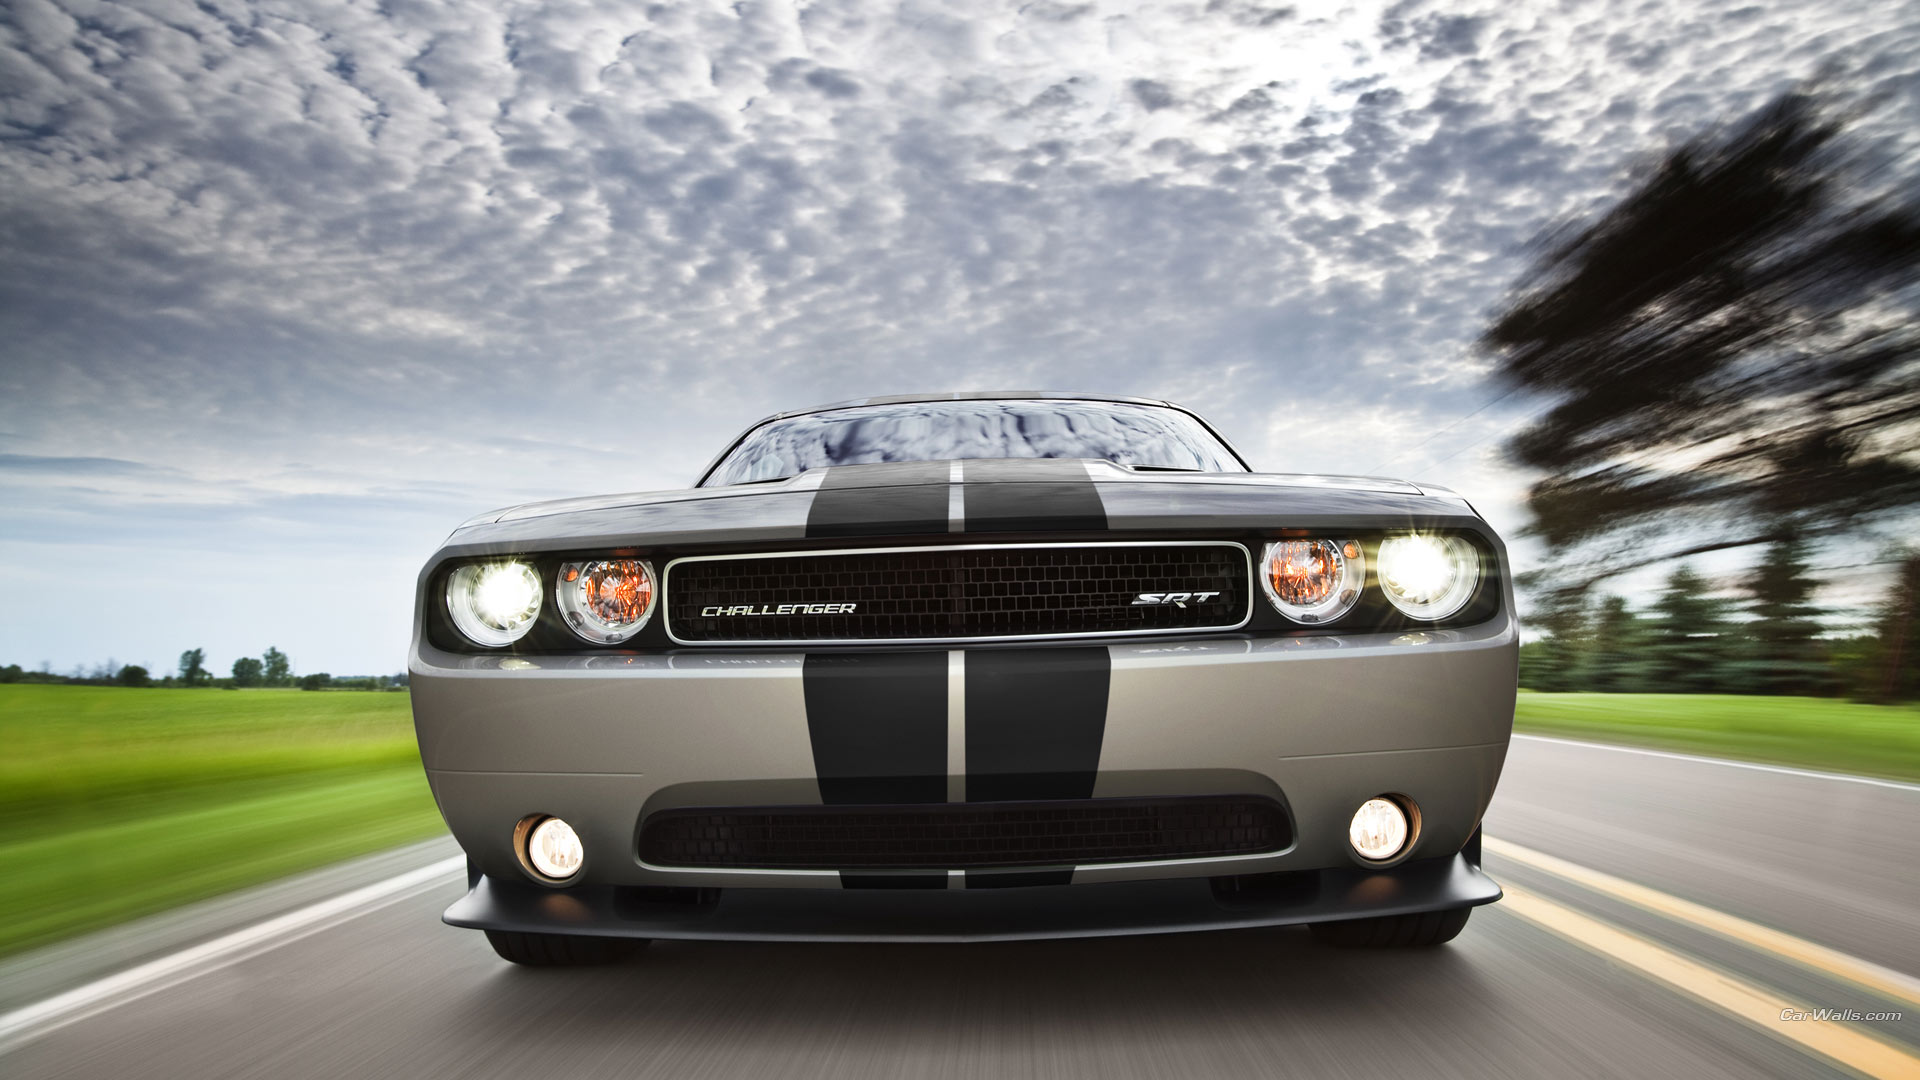 Dodge Challenger Srt8 392 1920x1080